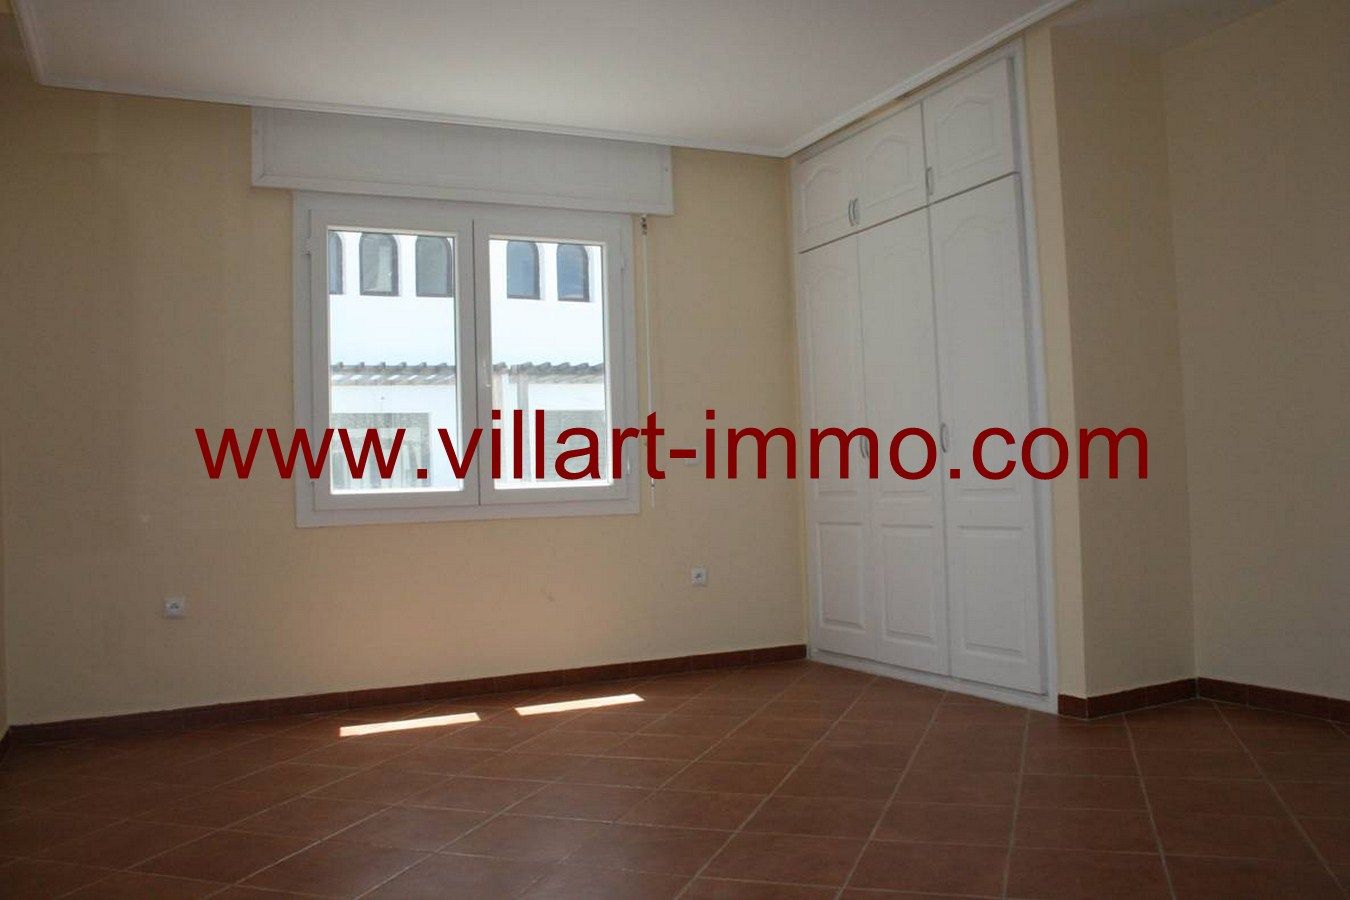 4-vente-appartement-tanger-malabata-chambre-2-va453-villart-immo